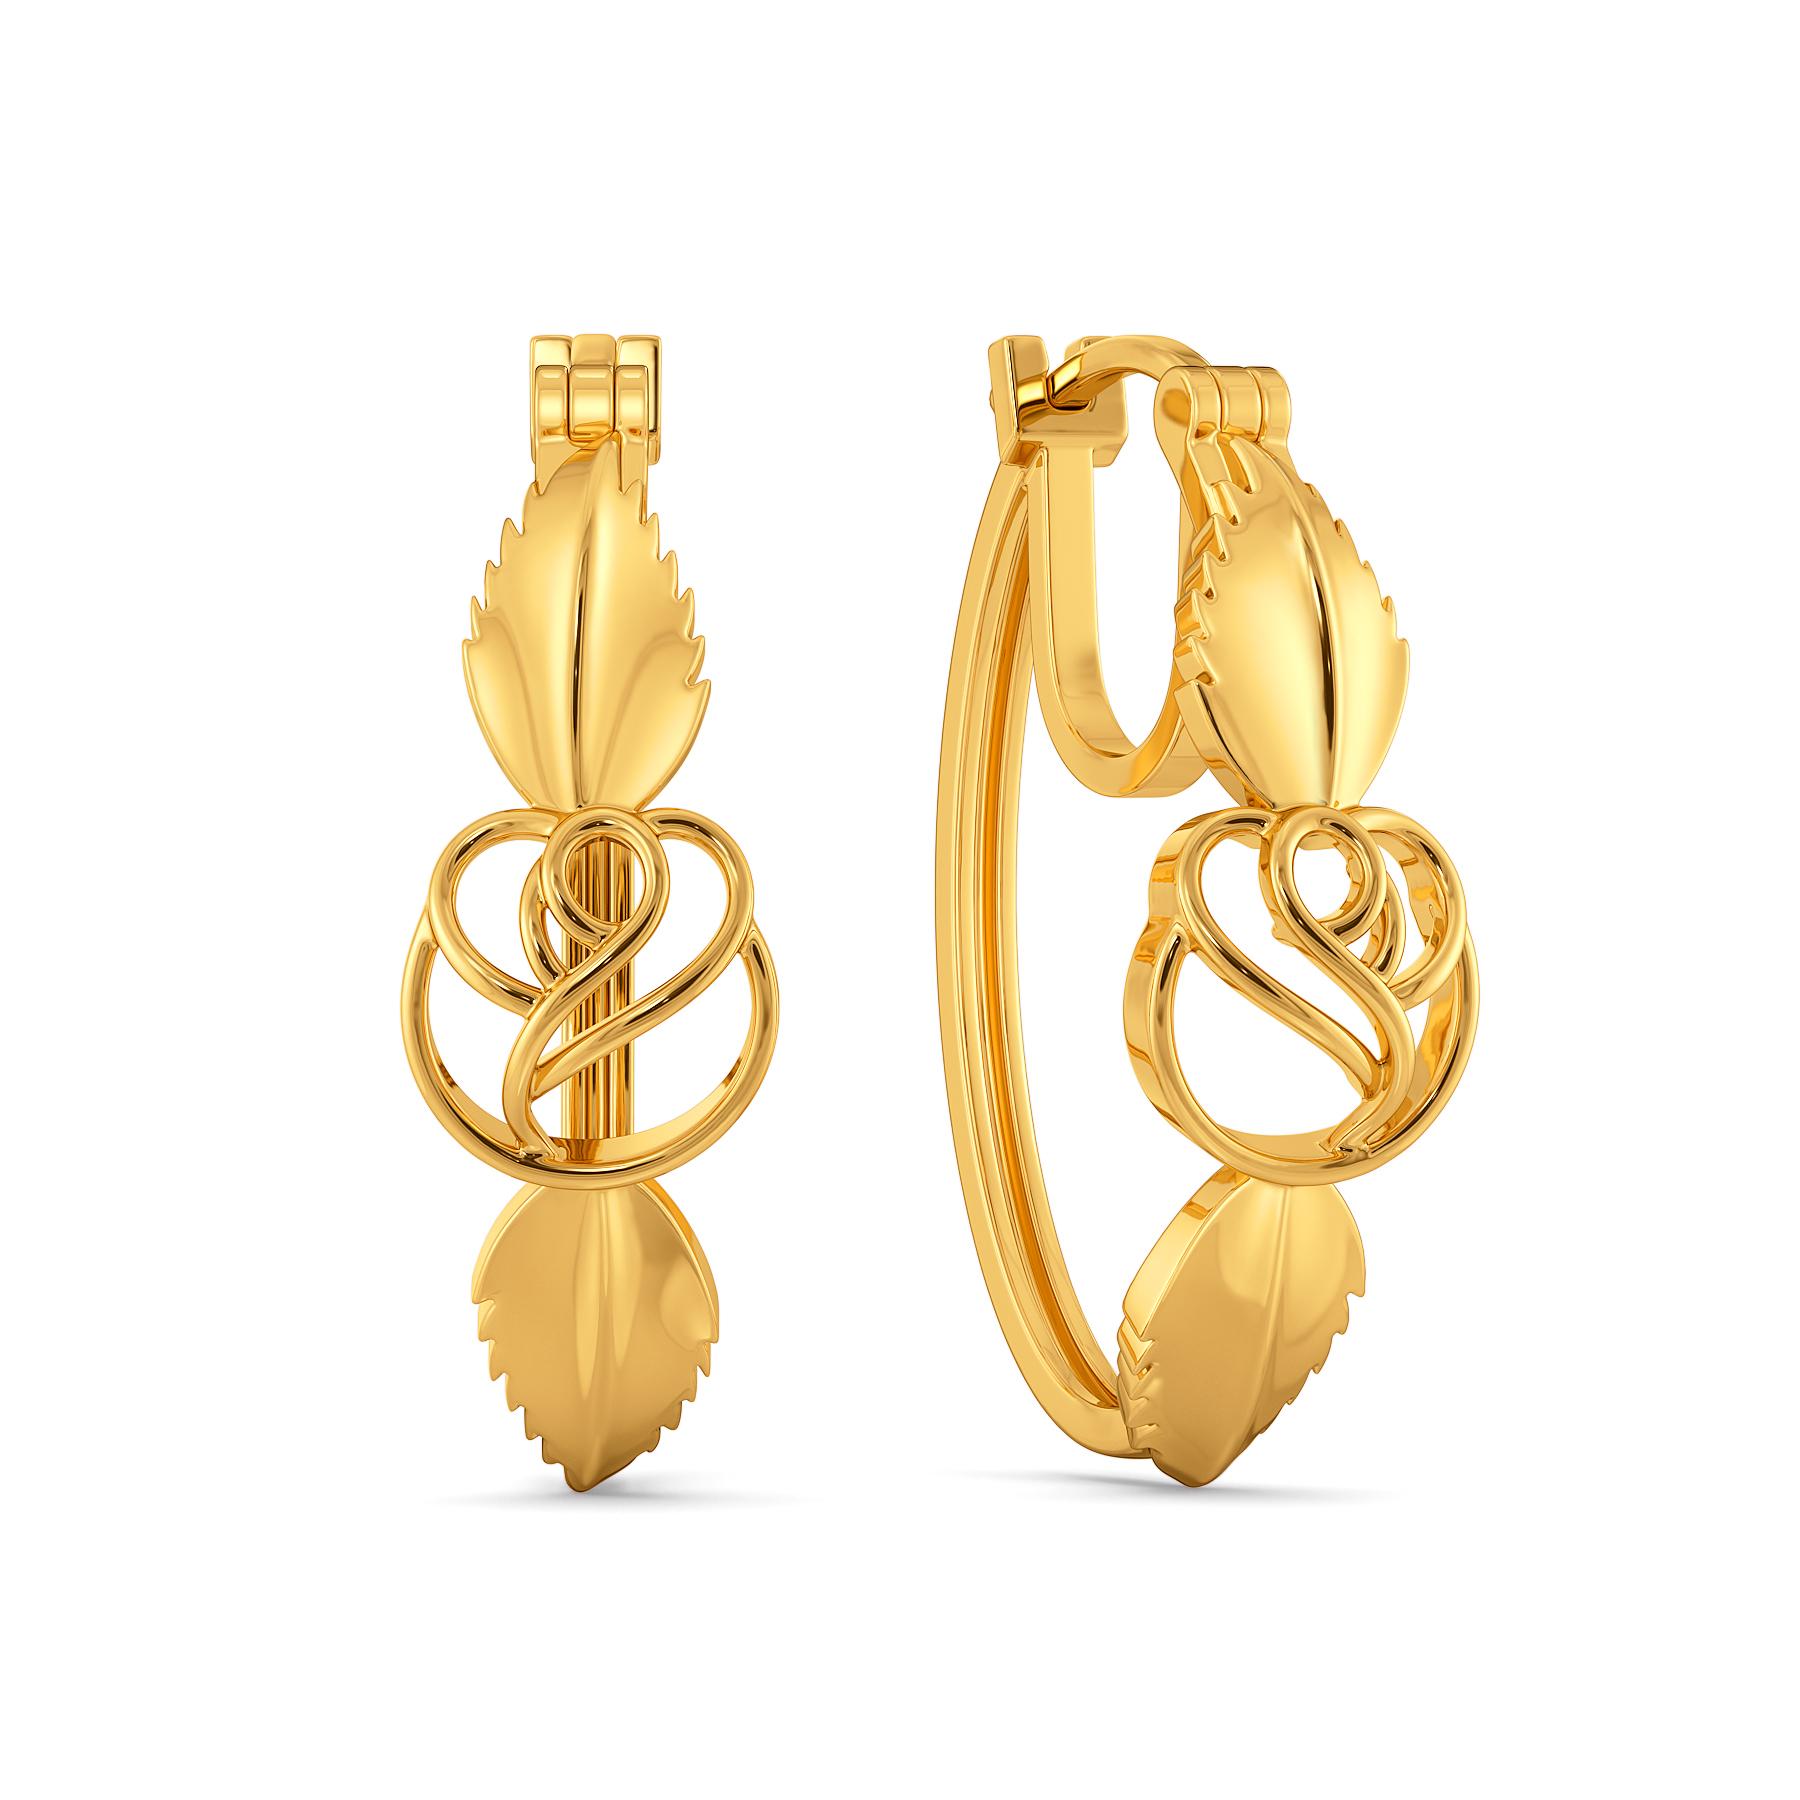 Thorn O Rouge Gold Earrings